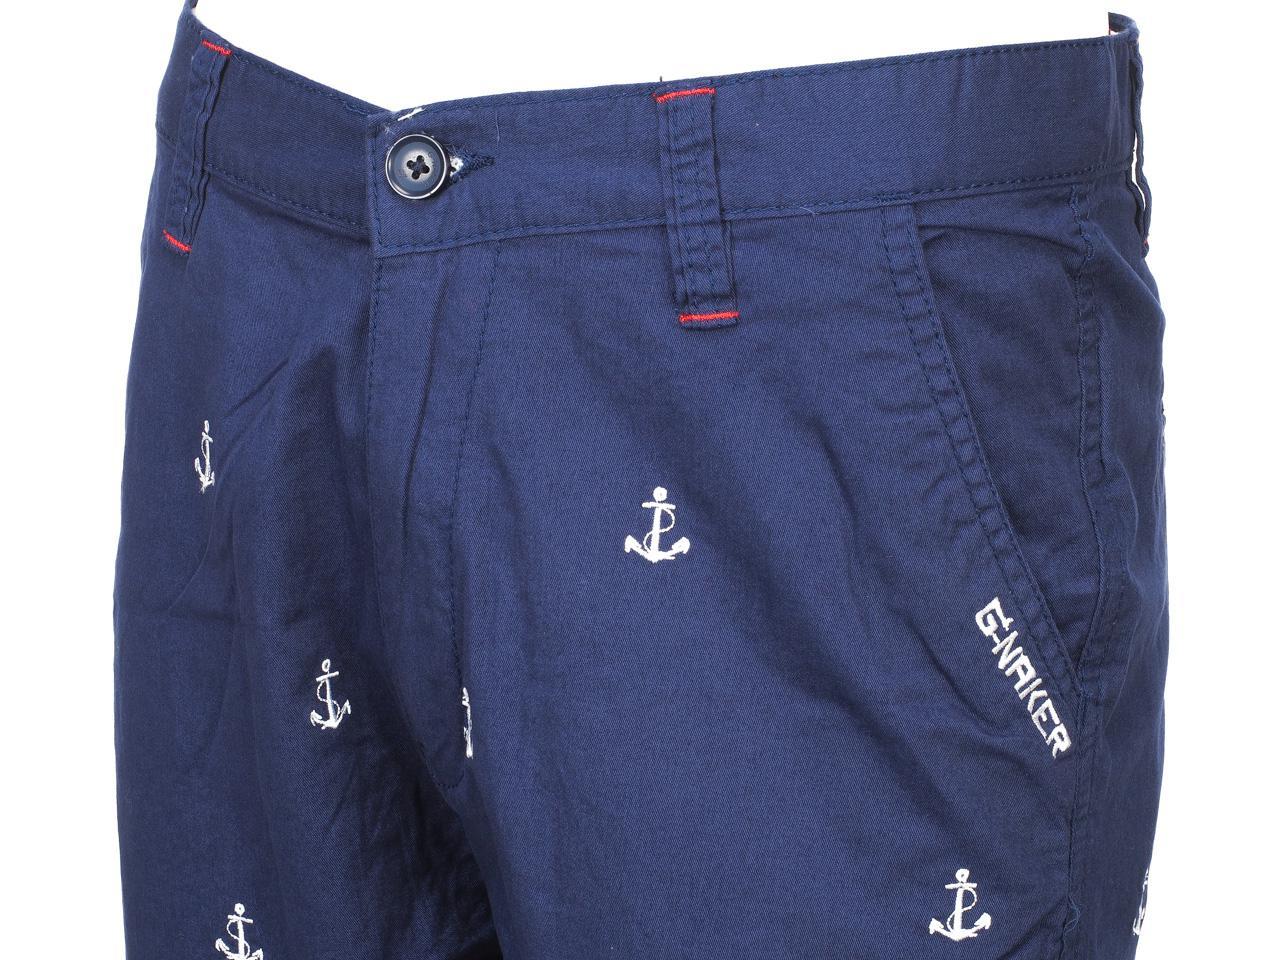 Bermuda-Shorts-G-naker-Mirbel-Navy-Bermuda-Blue-53397-New thumbnail 2